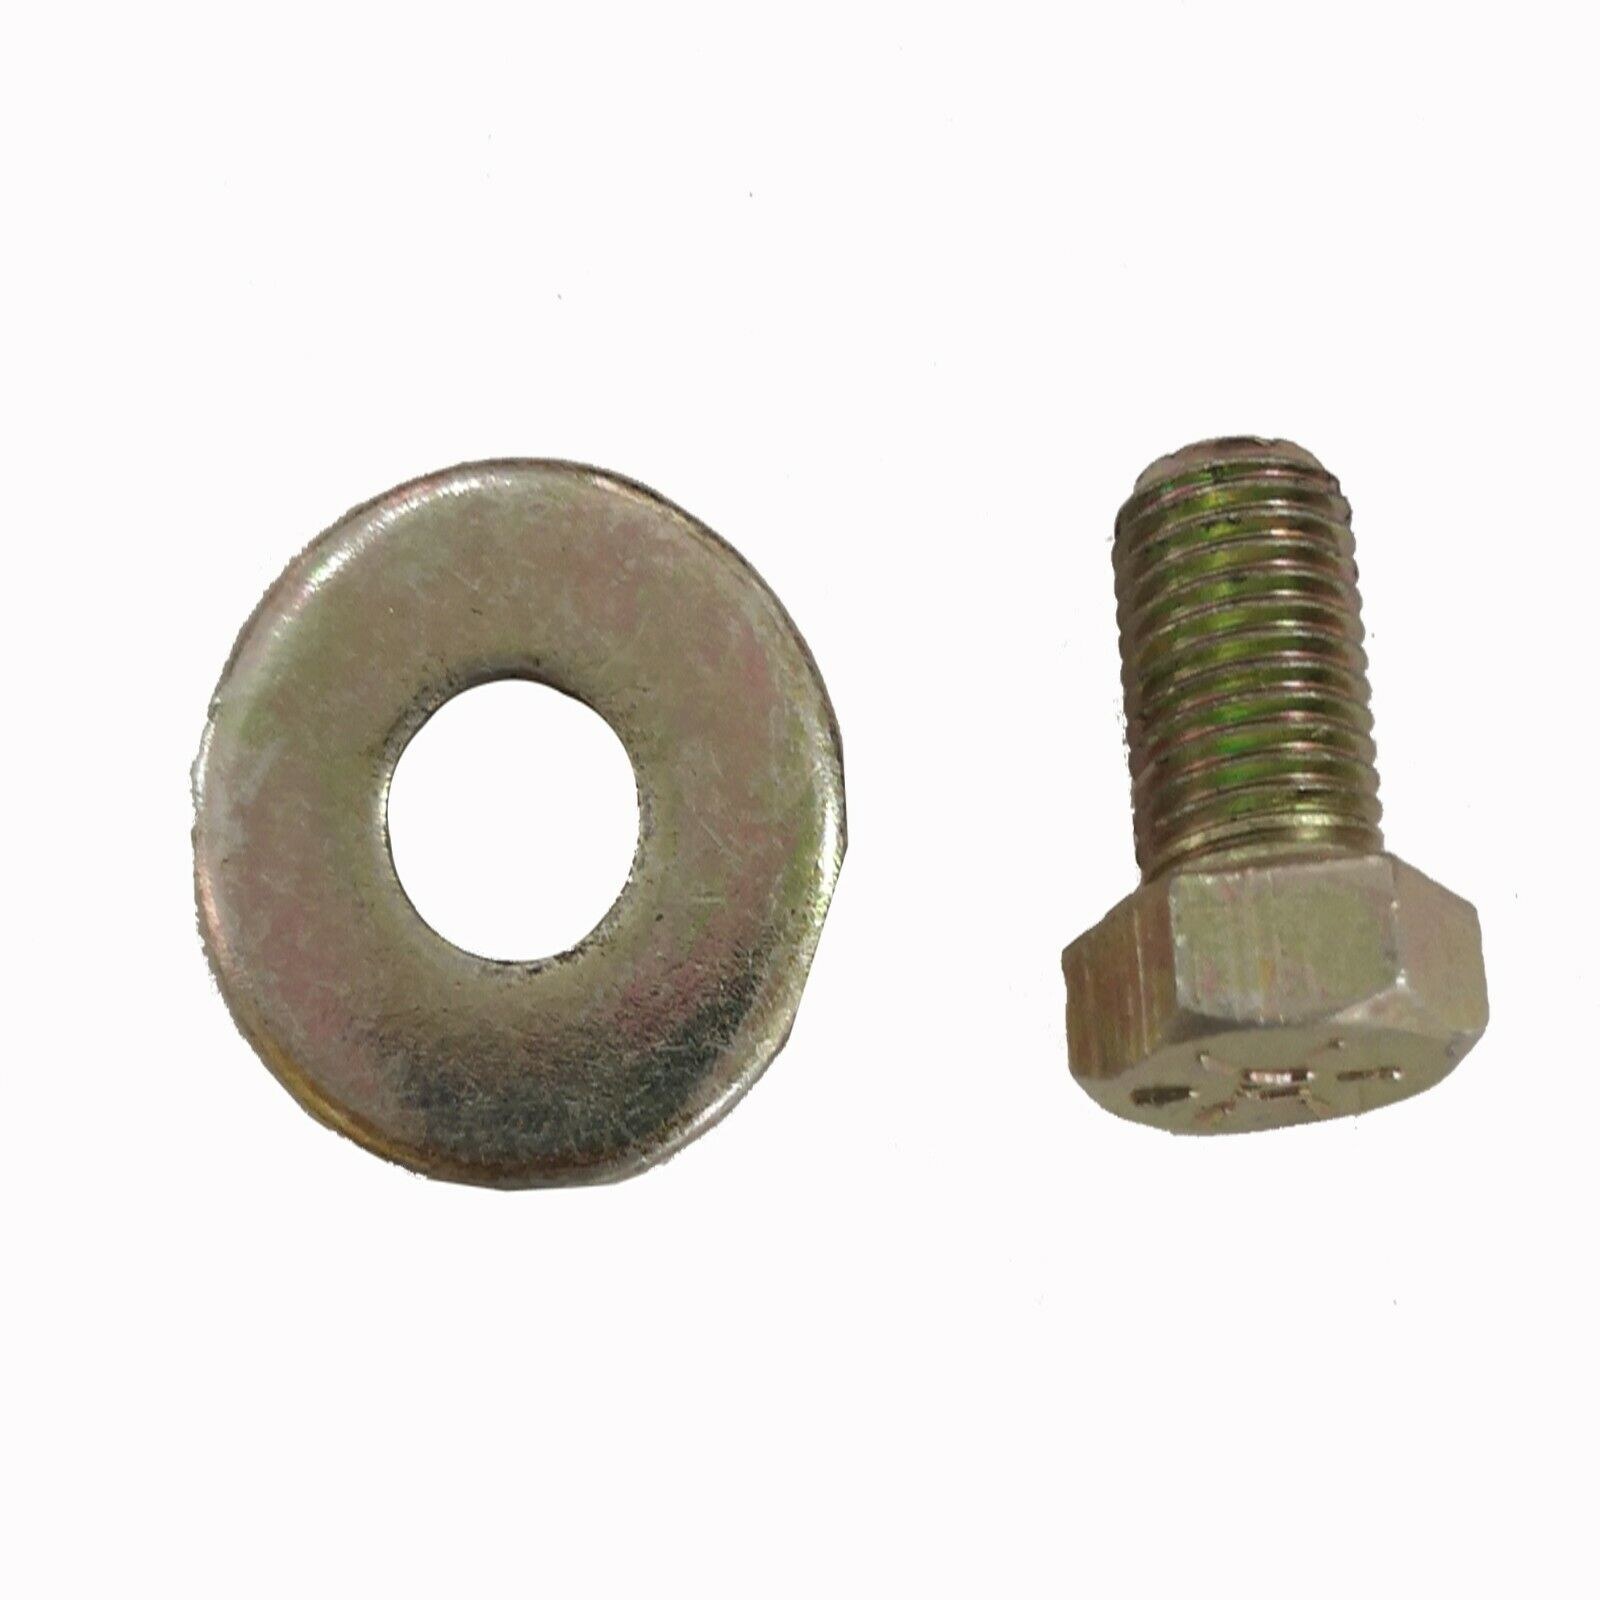 Pack of 6 L-Track Double Lug Threaded Stud Nut Fitting Gripon